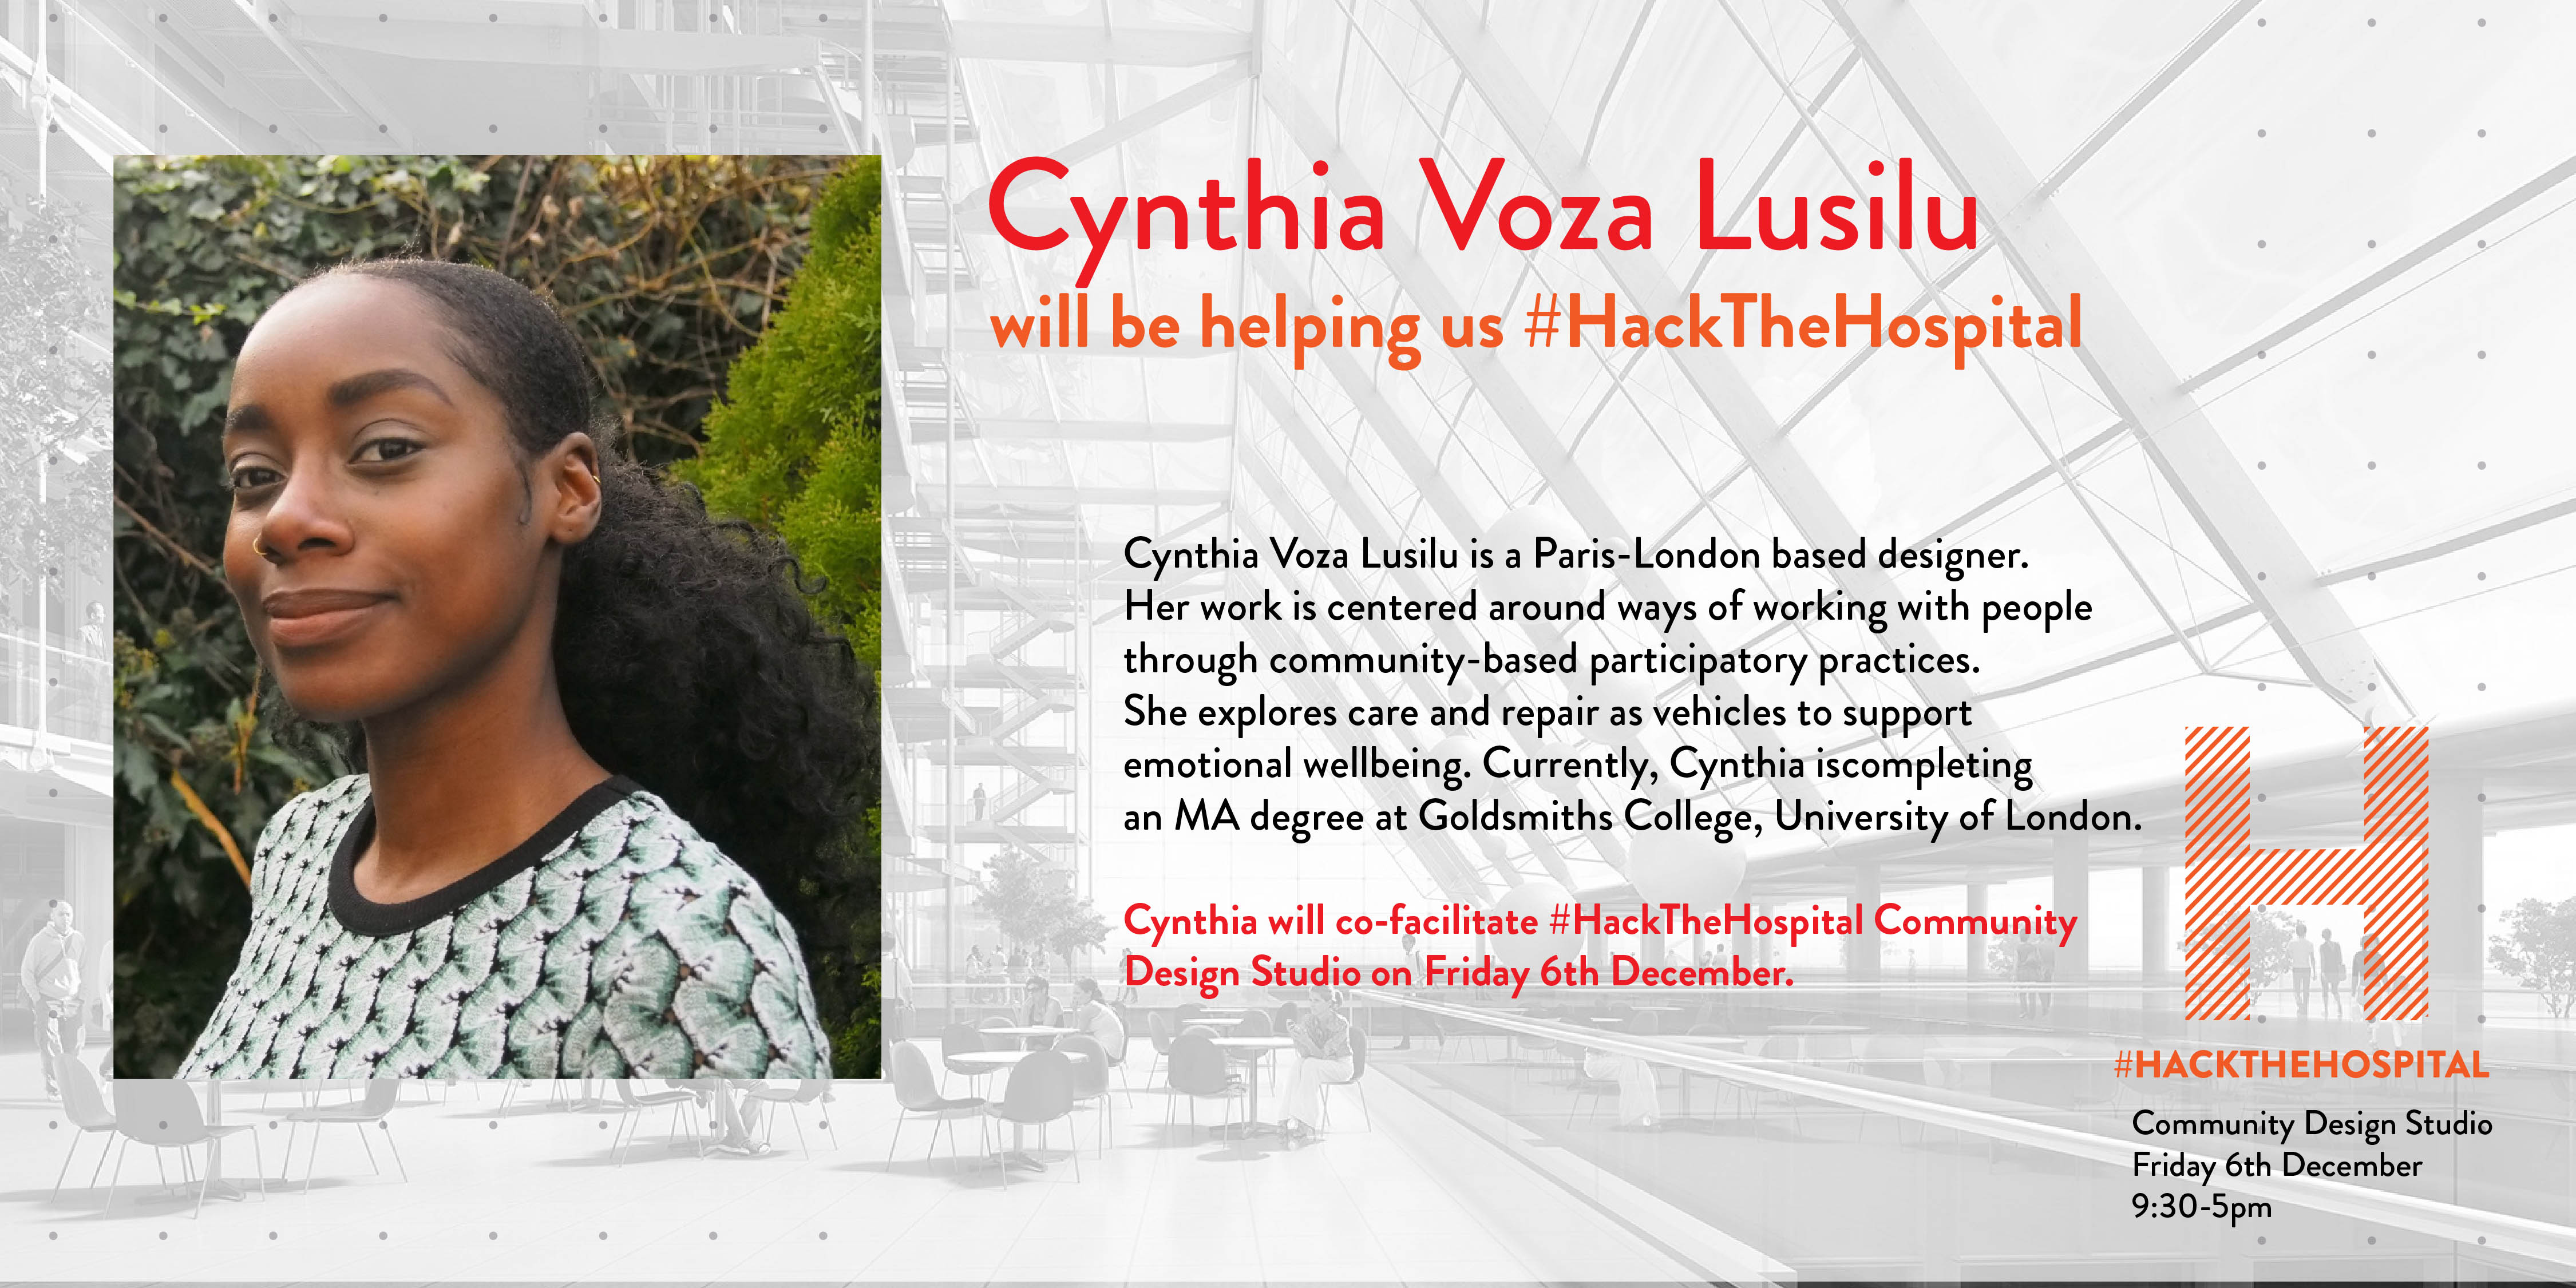 Cynthia Voza Lusilu